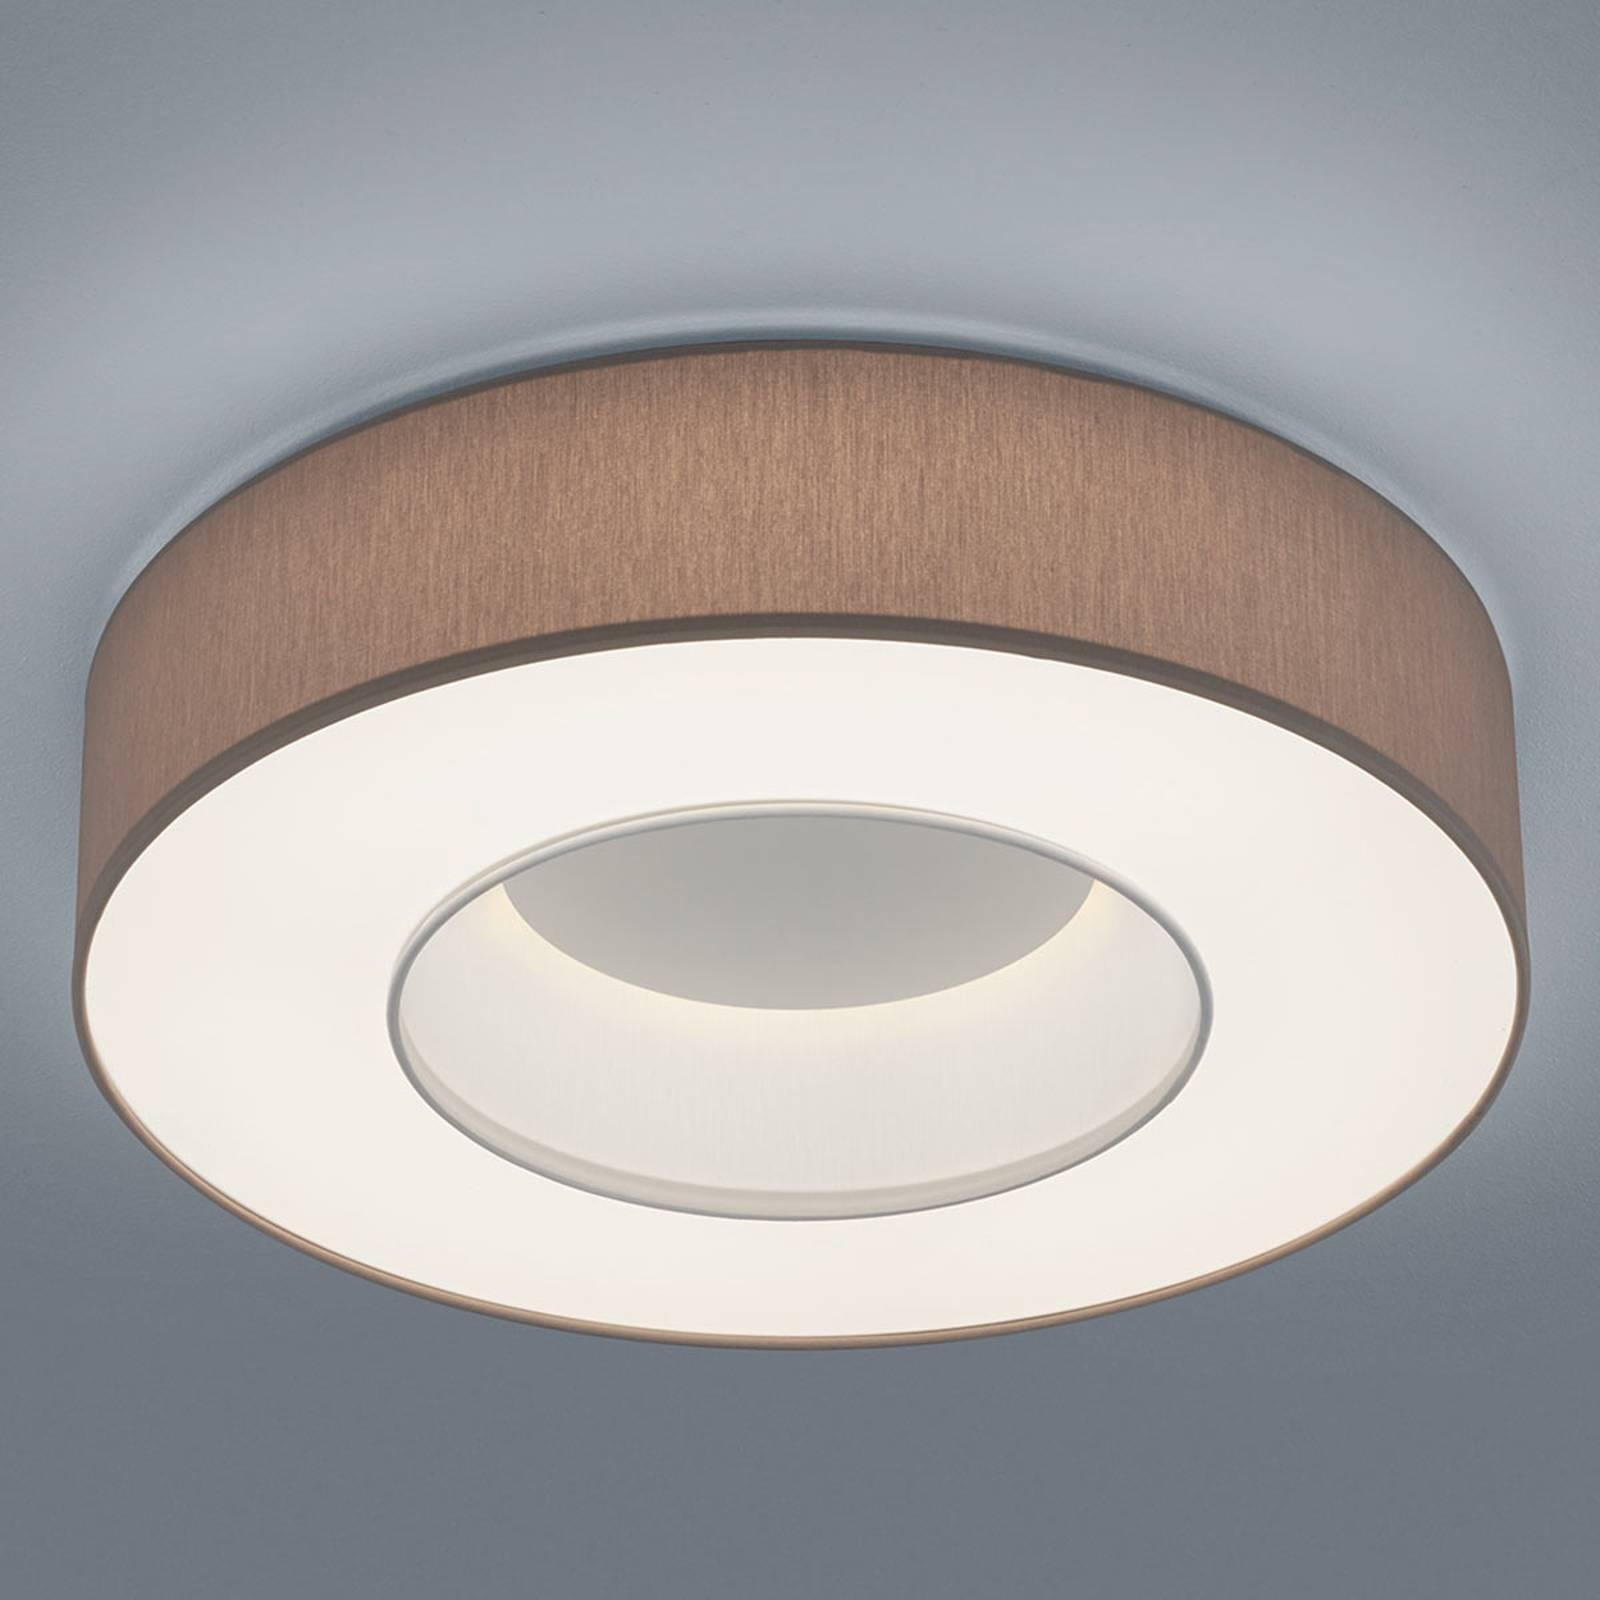 Helestra Lomo -LED-kattovalaisin, sintsi mokka